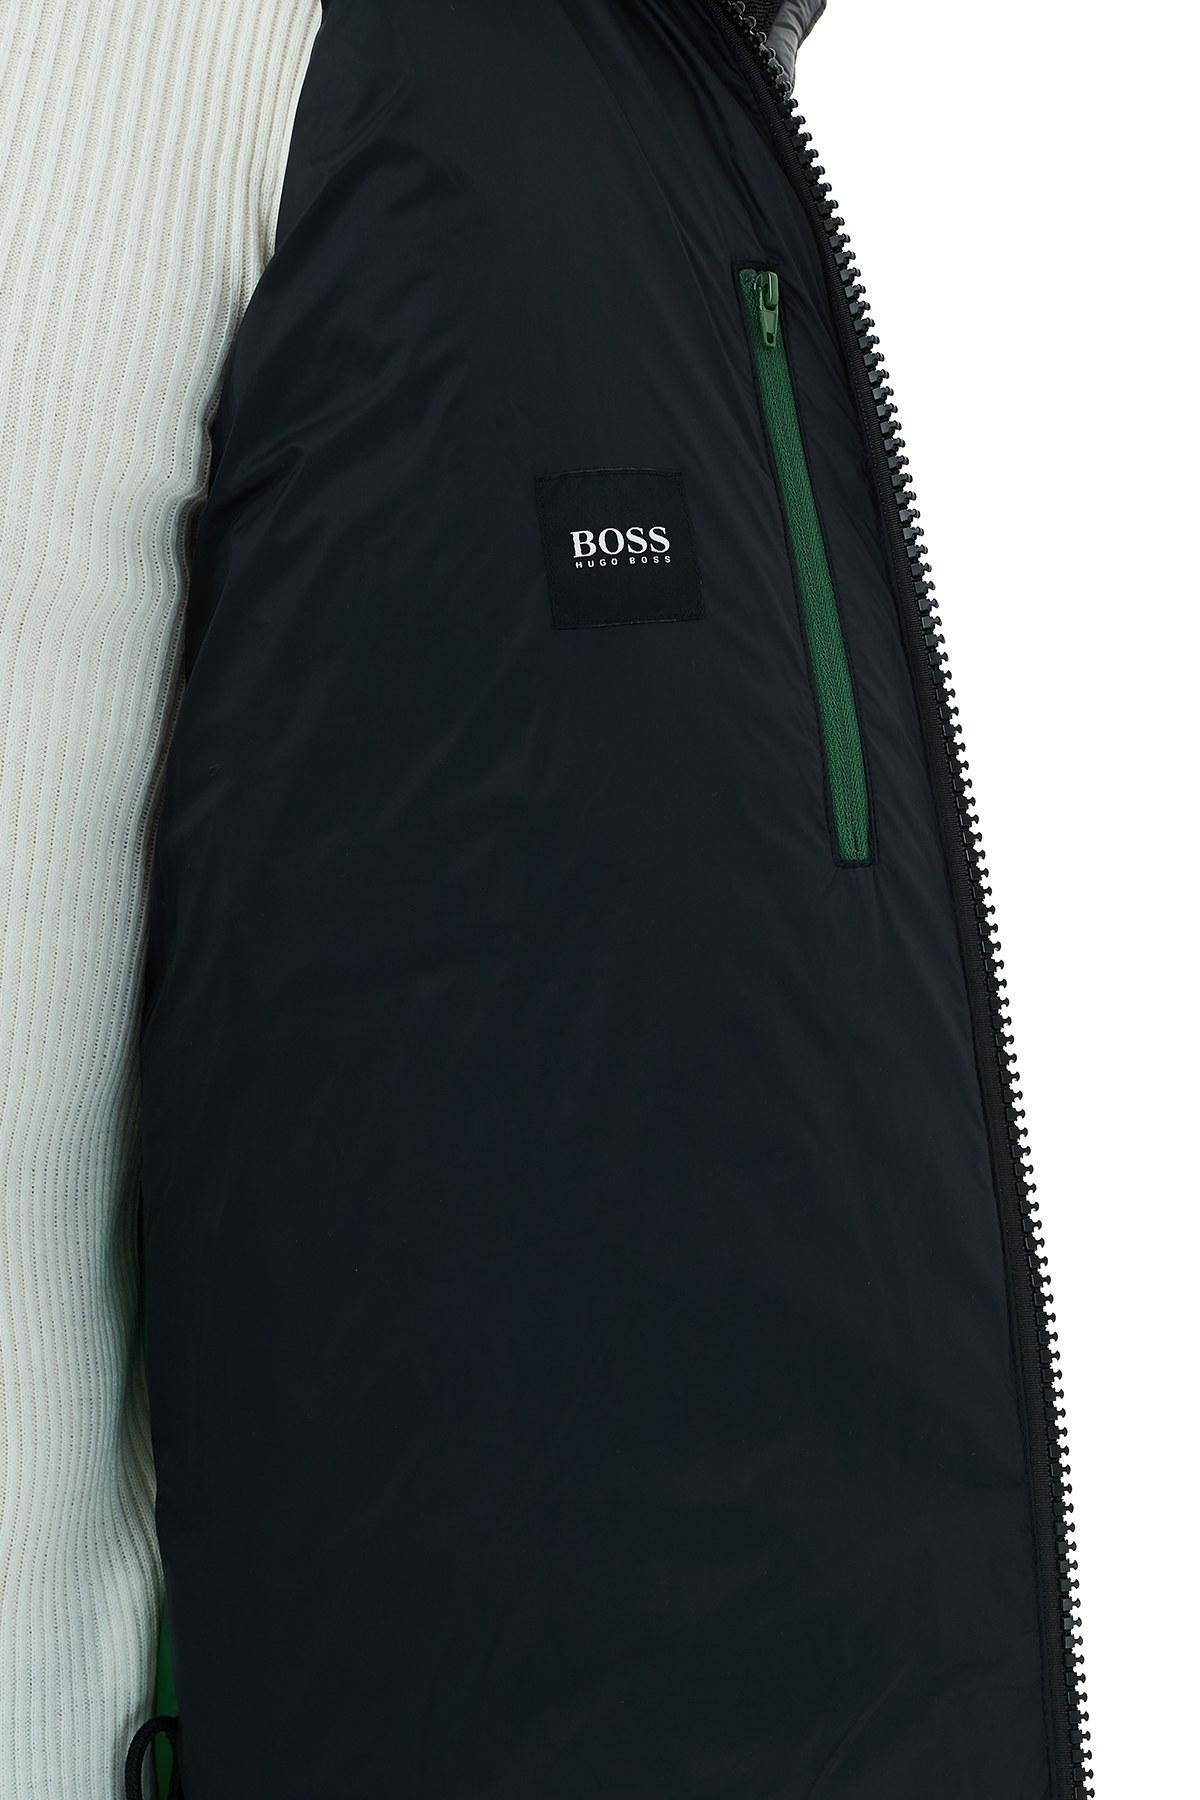 Hugo Boss Regular Fit Kapüşonlu Cepli Şişme Erkek Mont 50436643 001 SİYAH